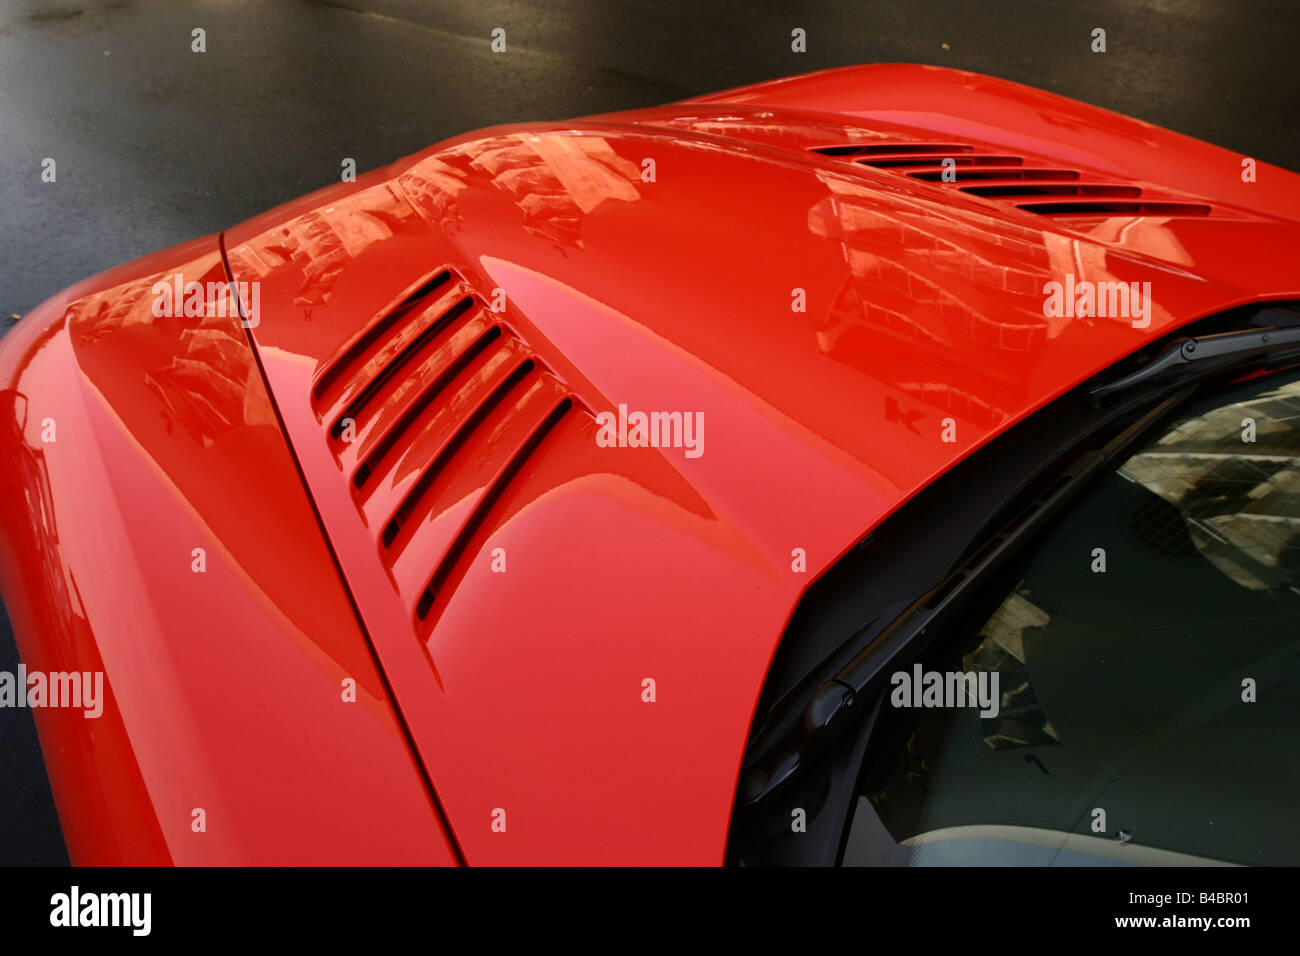 Car, Dodge Viper SRT-10, Convertible, model year 2003-, red, FGHDS, Detailed view, bonnet, technique/accessory, - Stock Image